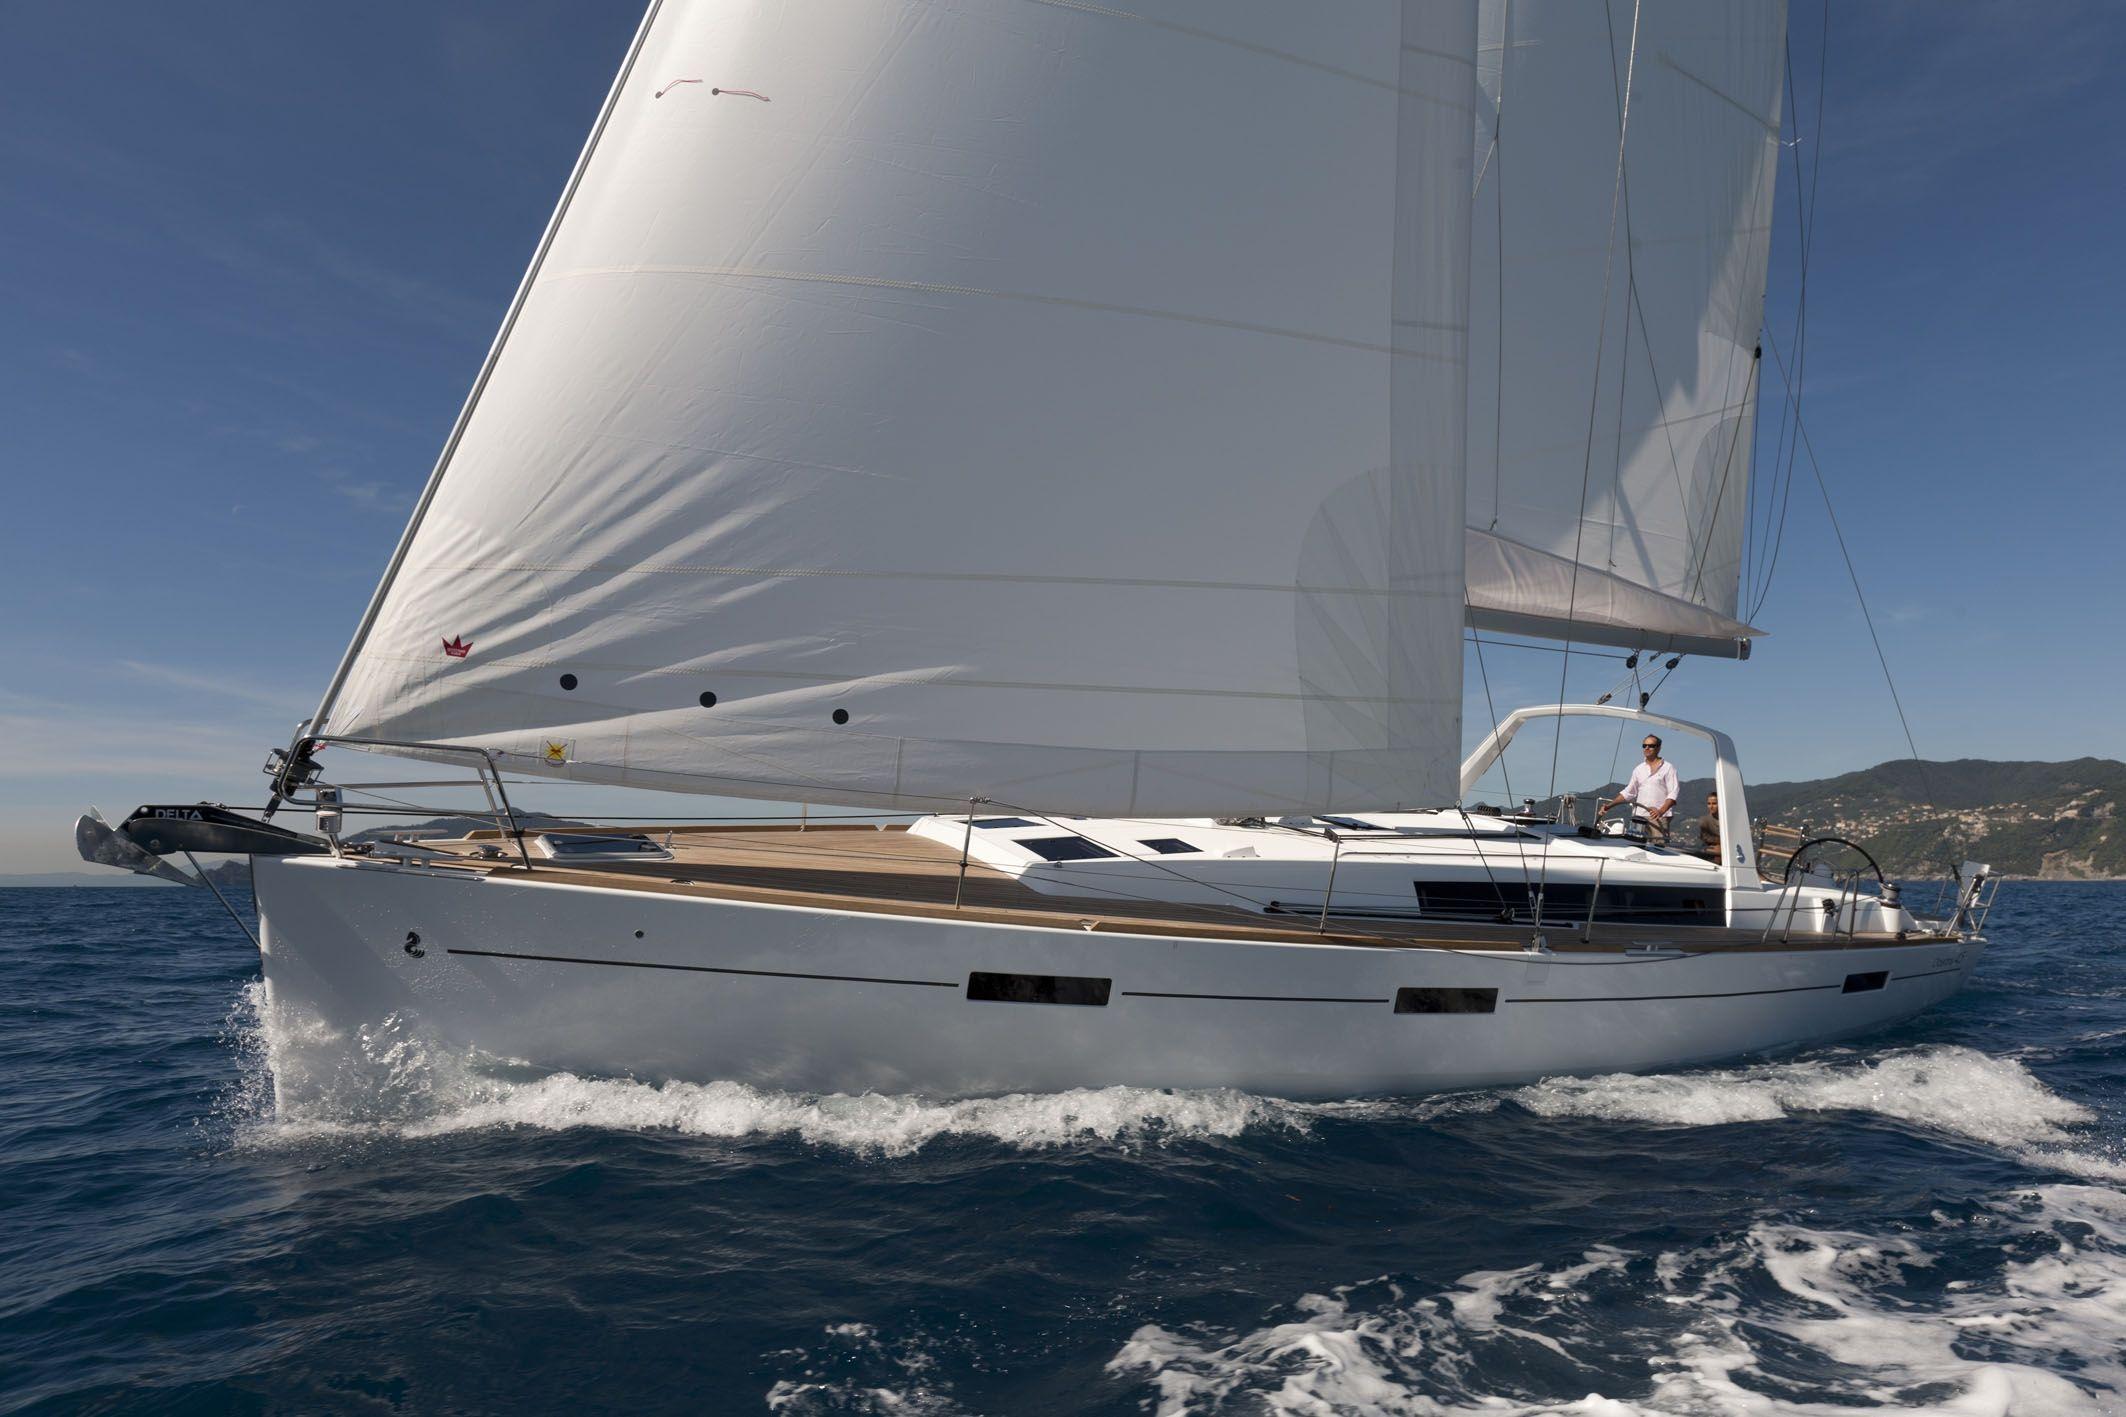 Oceanis 45 - 4 Cabins - Formentera - Ibiza